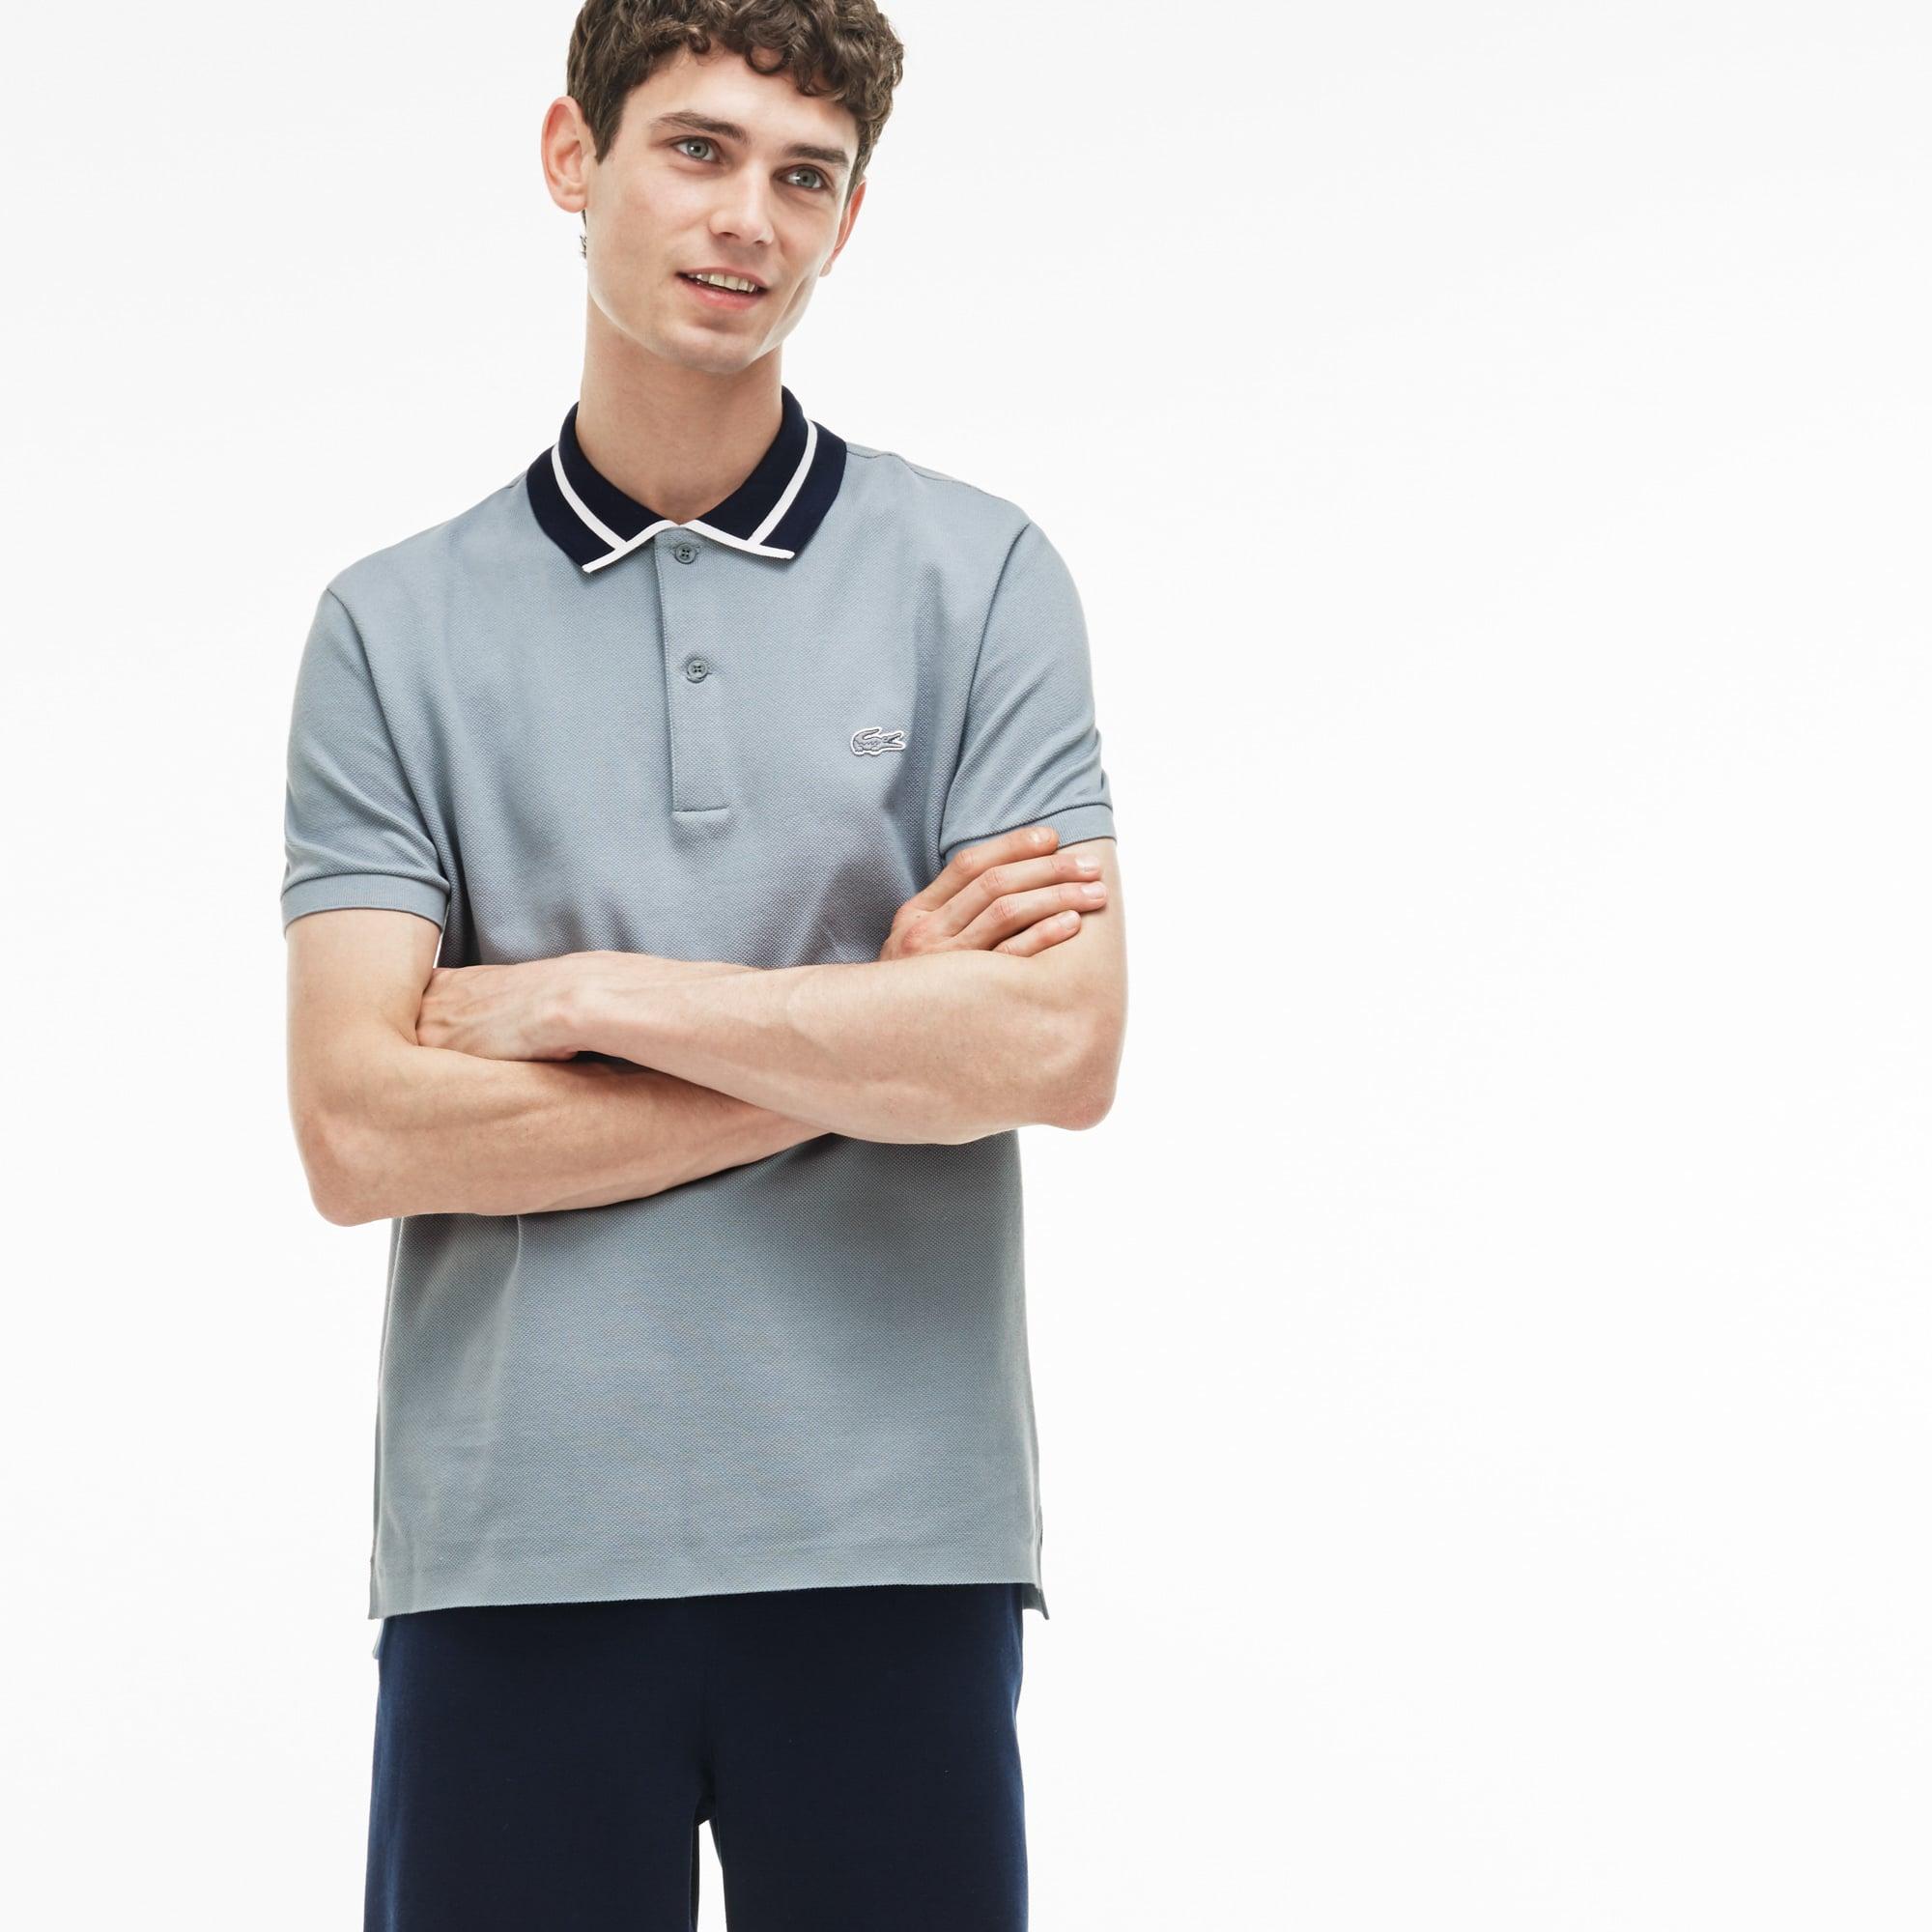 Men's Slim Fit Piped Thick Cotton Piqué Polo